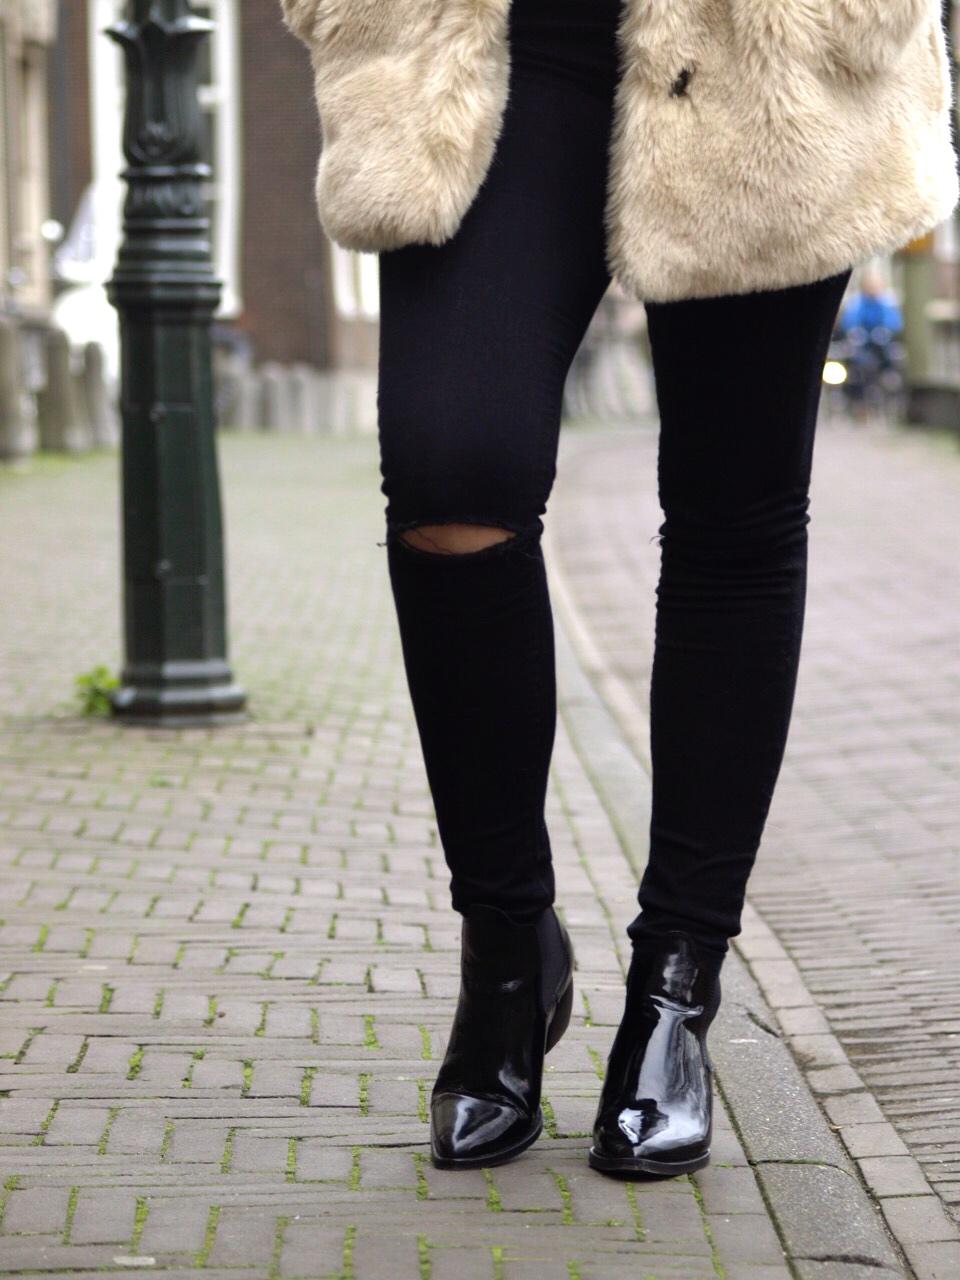 blogger, blog, dominique, candido, fashion, mode, zara, asos, jeans, turtleneck, mango, topshop, boots, prada, sunglasses, outfit, post